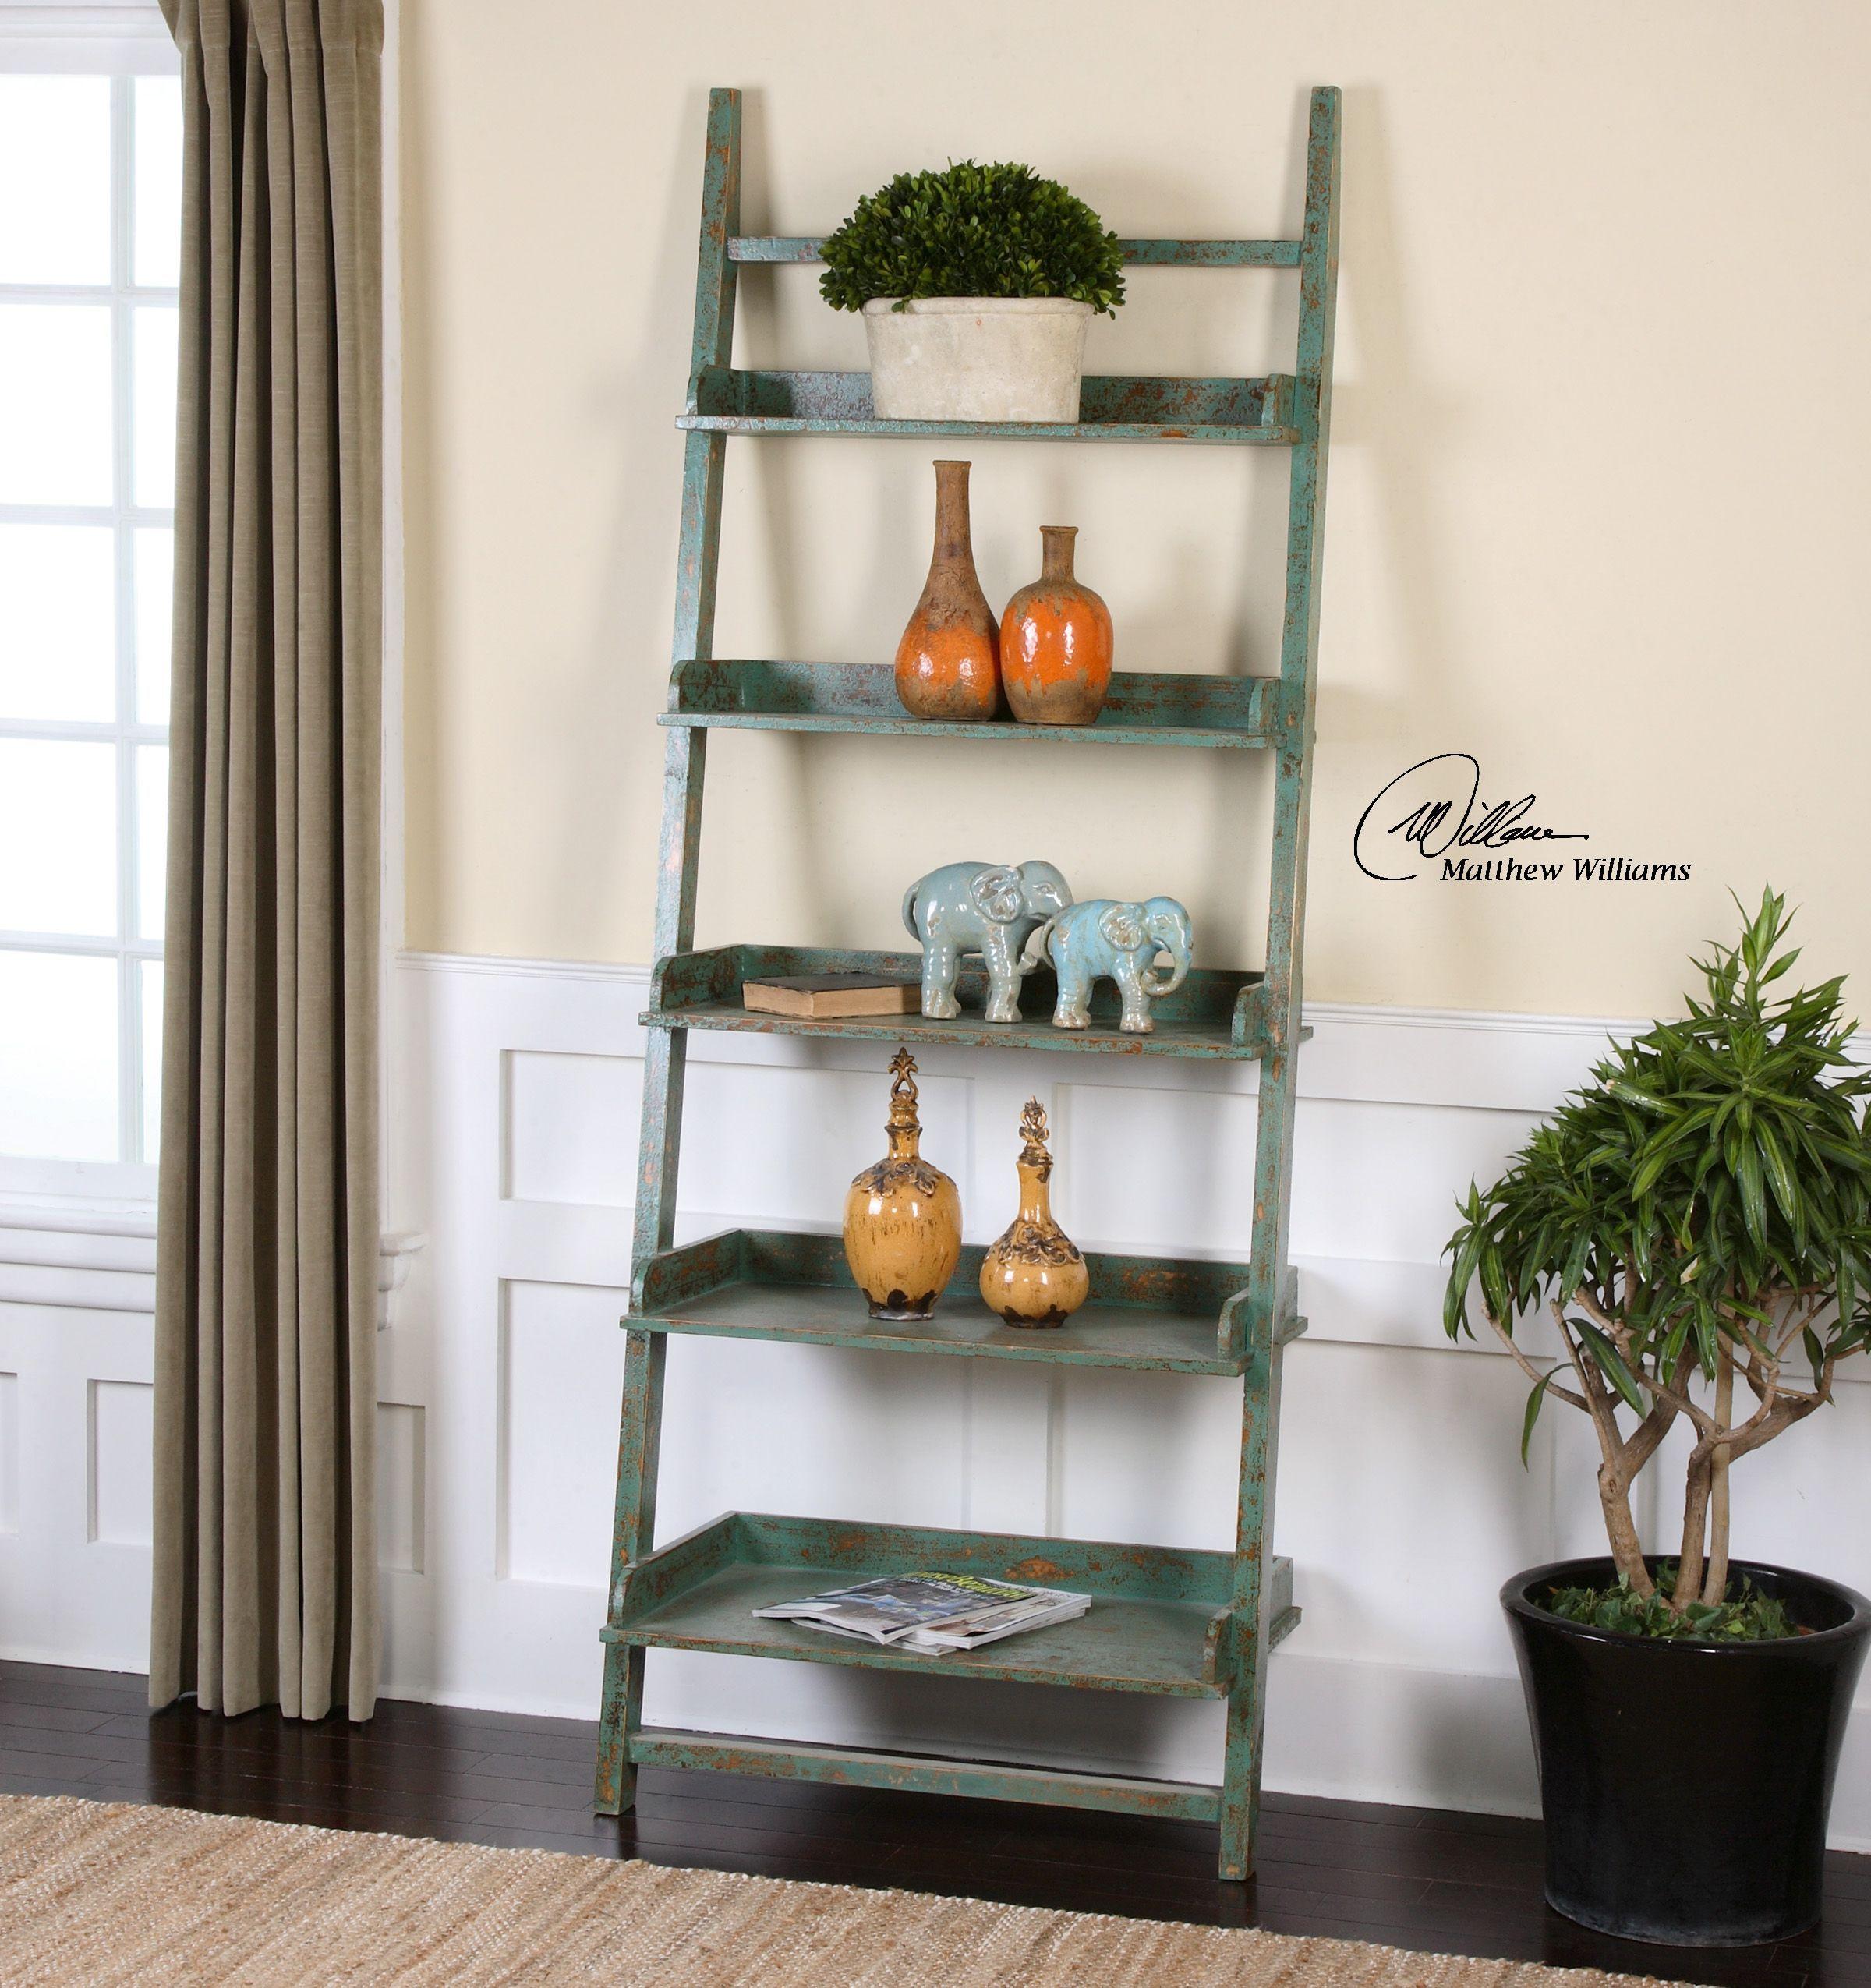 Uttermost norvin etagere bookshelf newuttermost pinterest